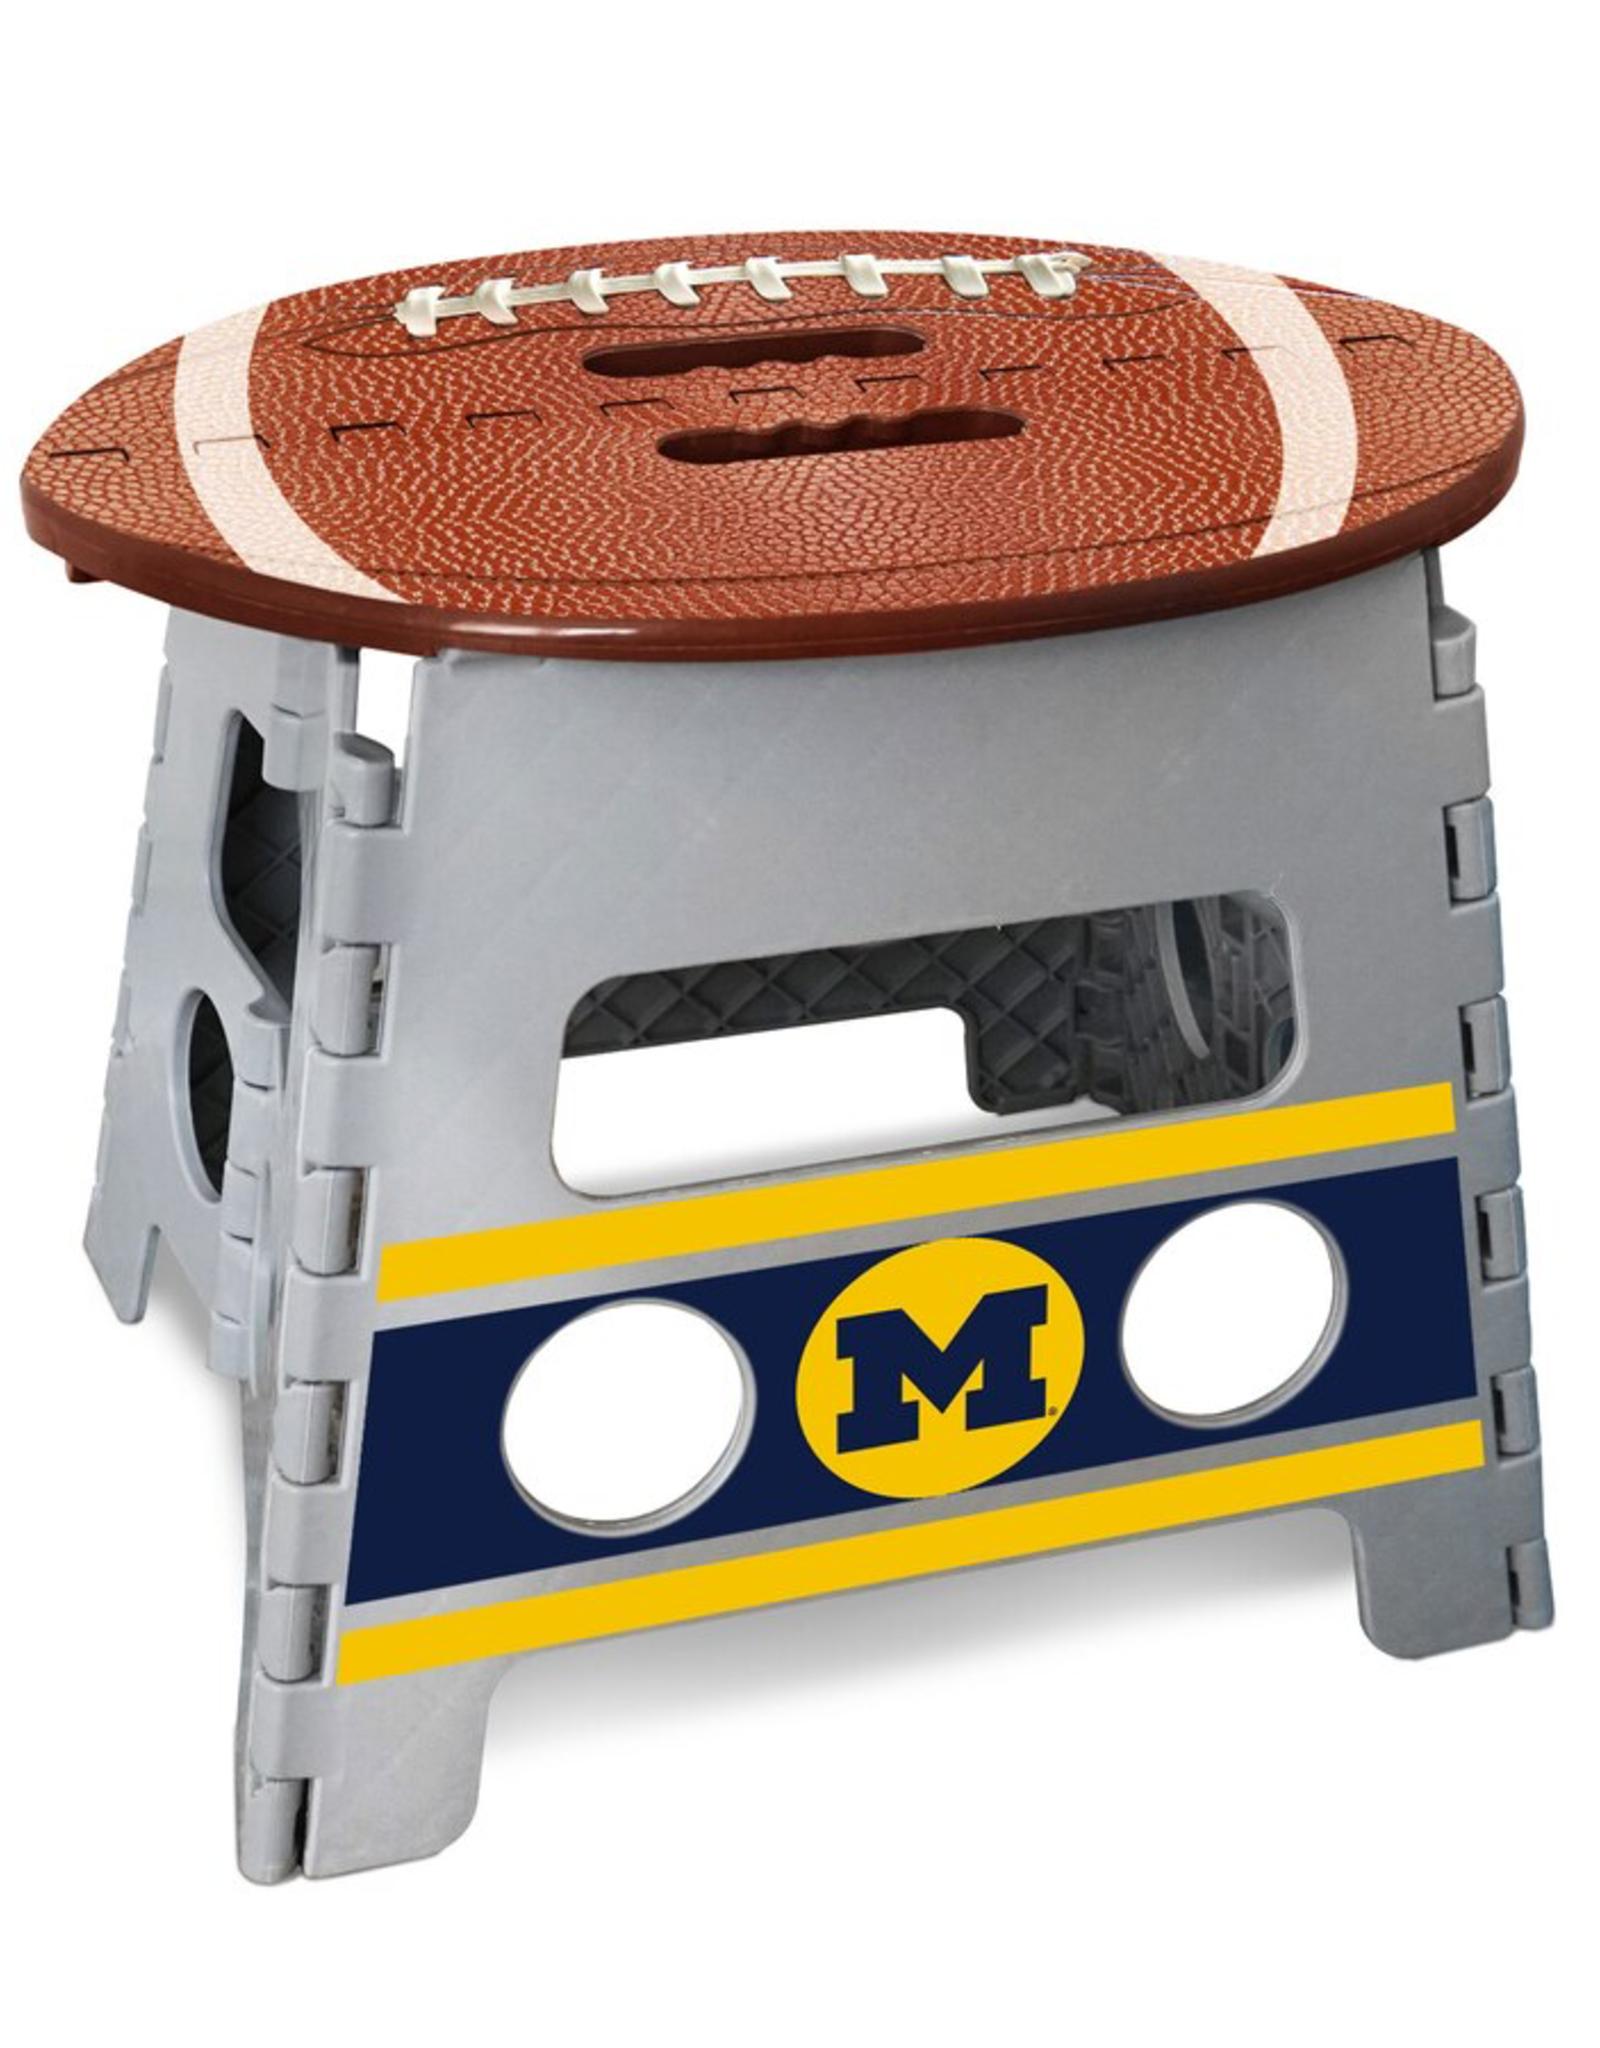 FANMATS Michigan Wolverines Step Stool